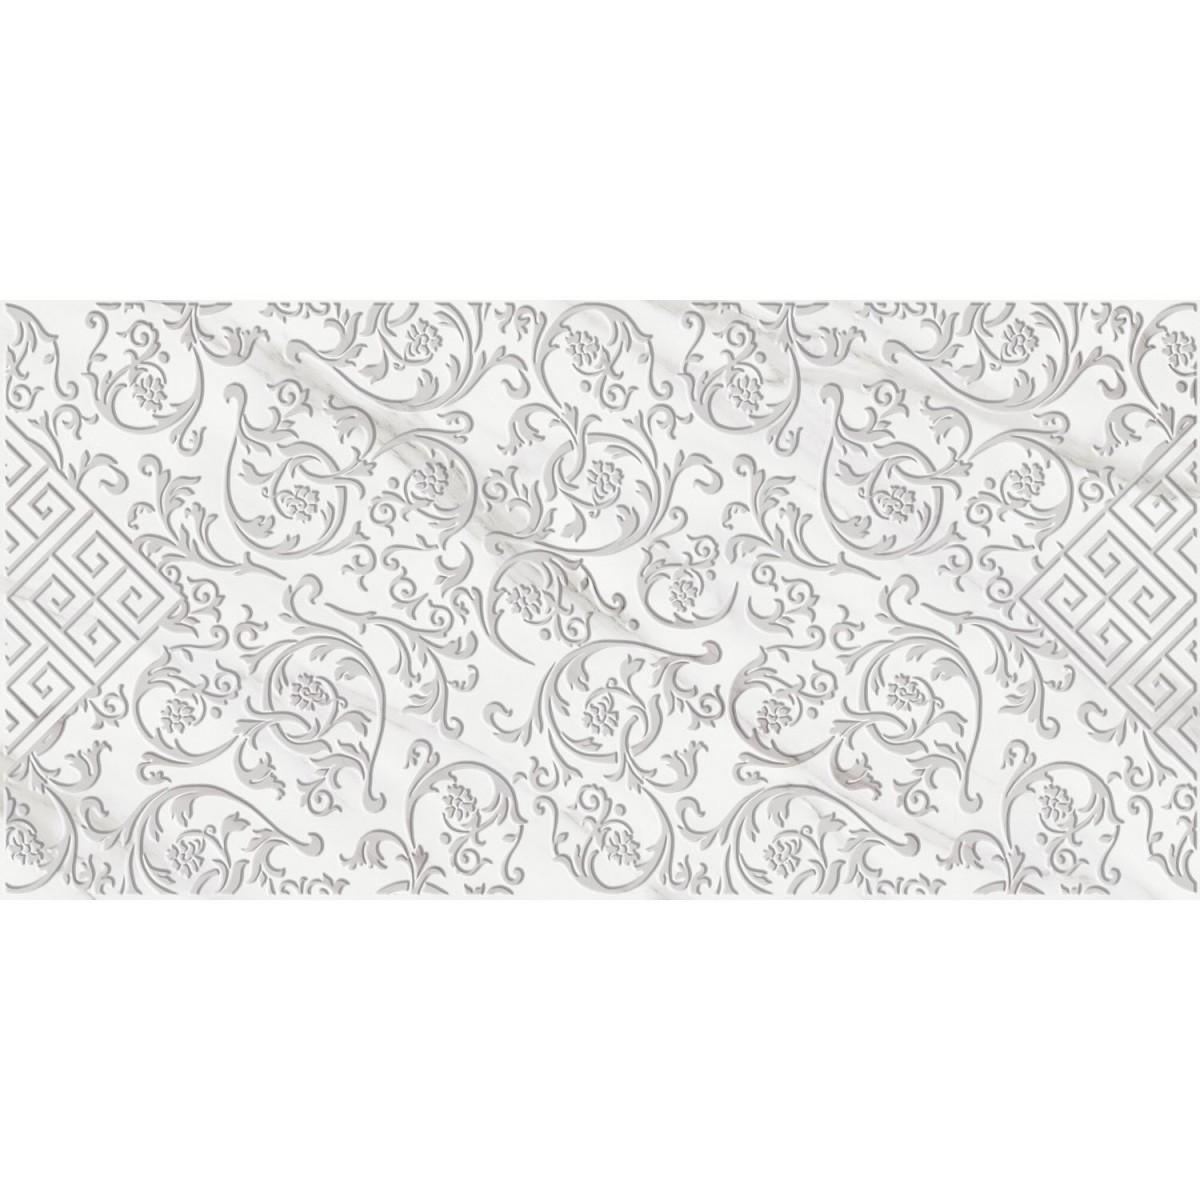 ДекорCarrara Antika 25х50 см цвет белый